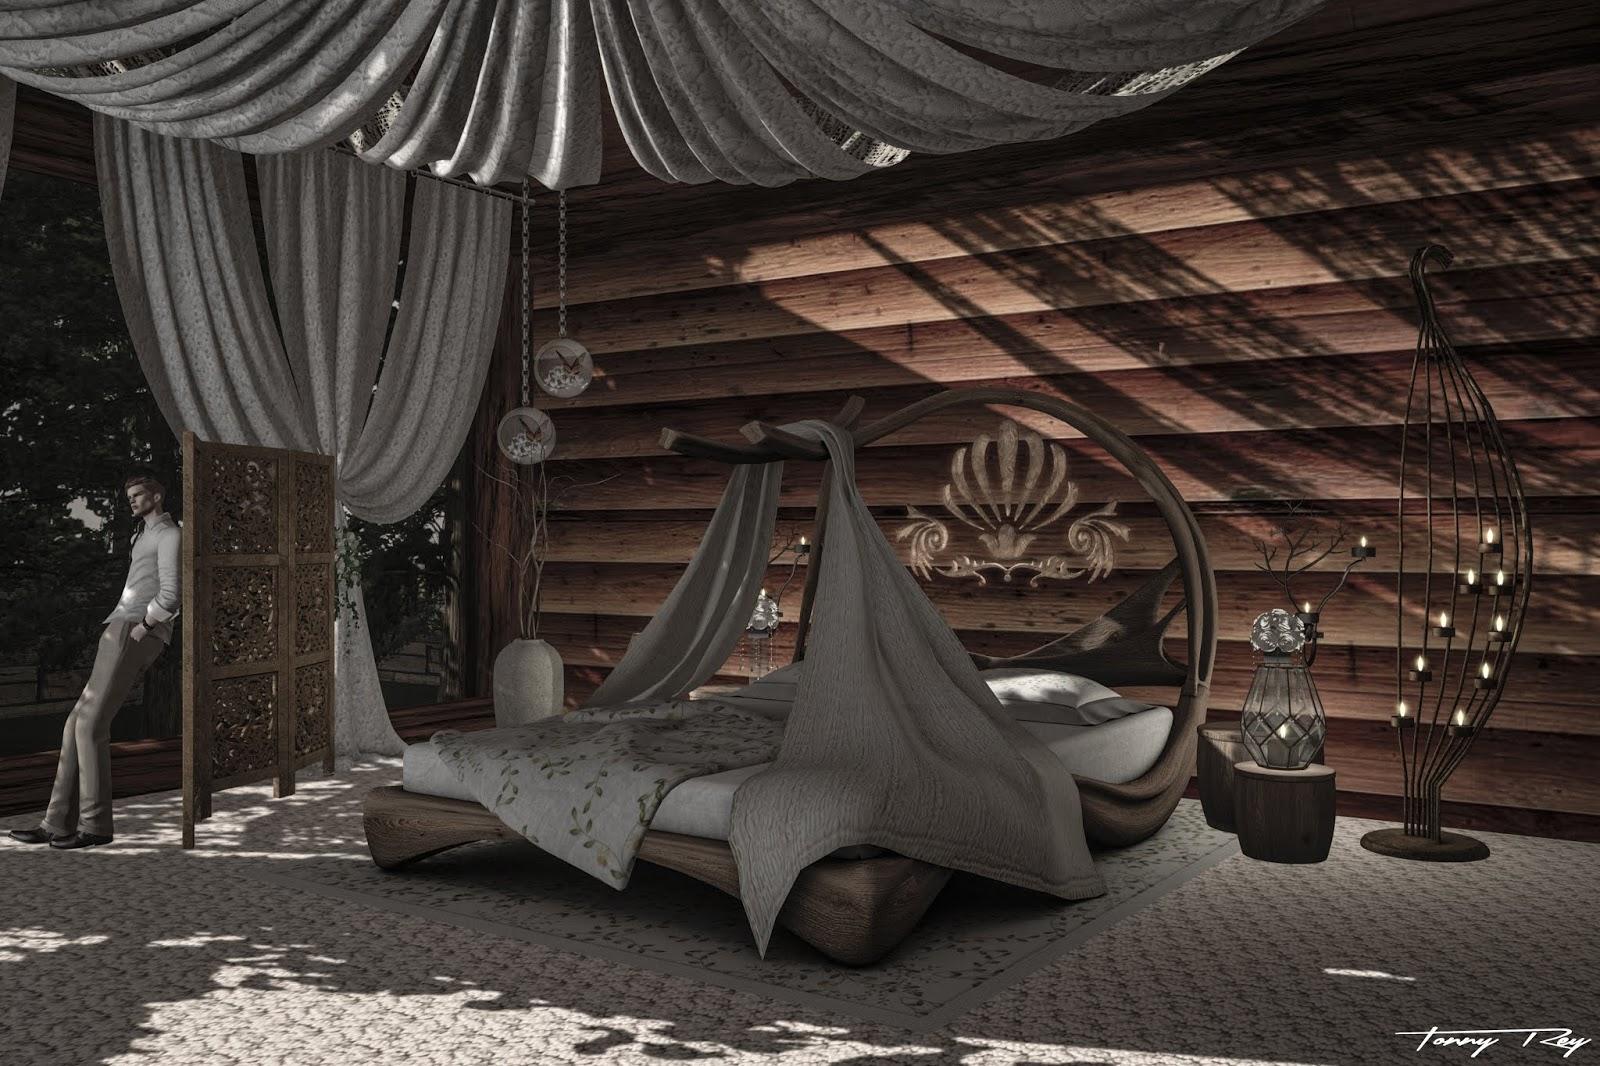 Swank Event - Store EVHAH & Enchanted Fantasy